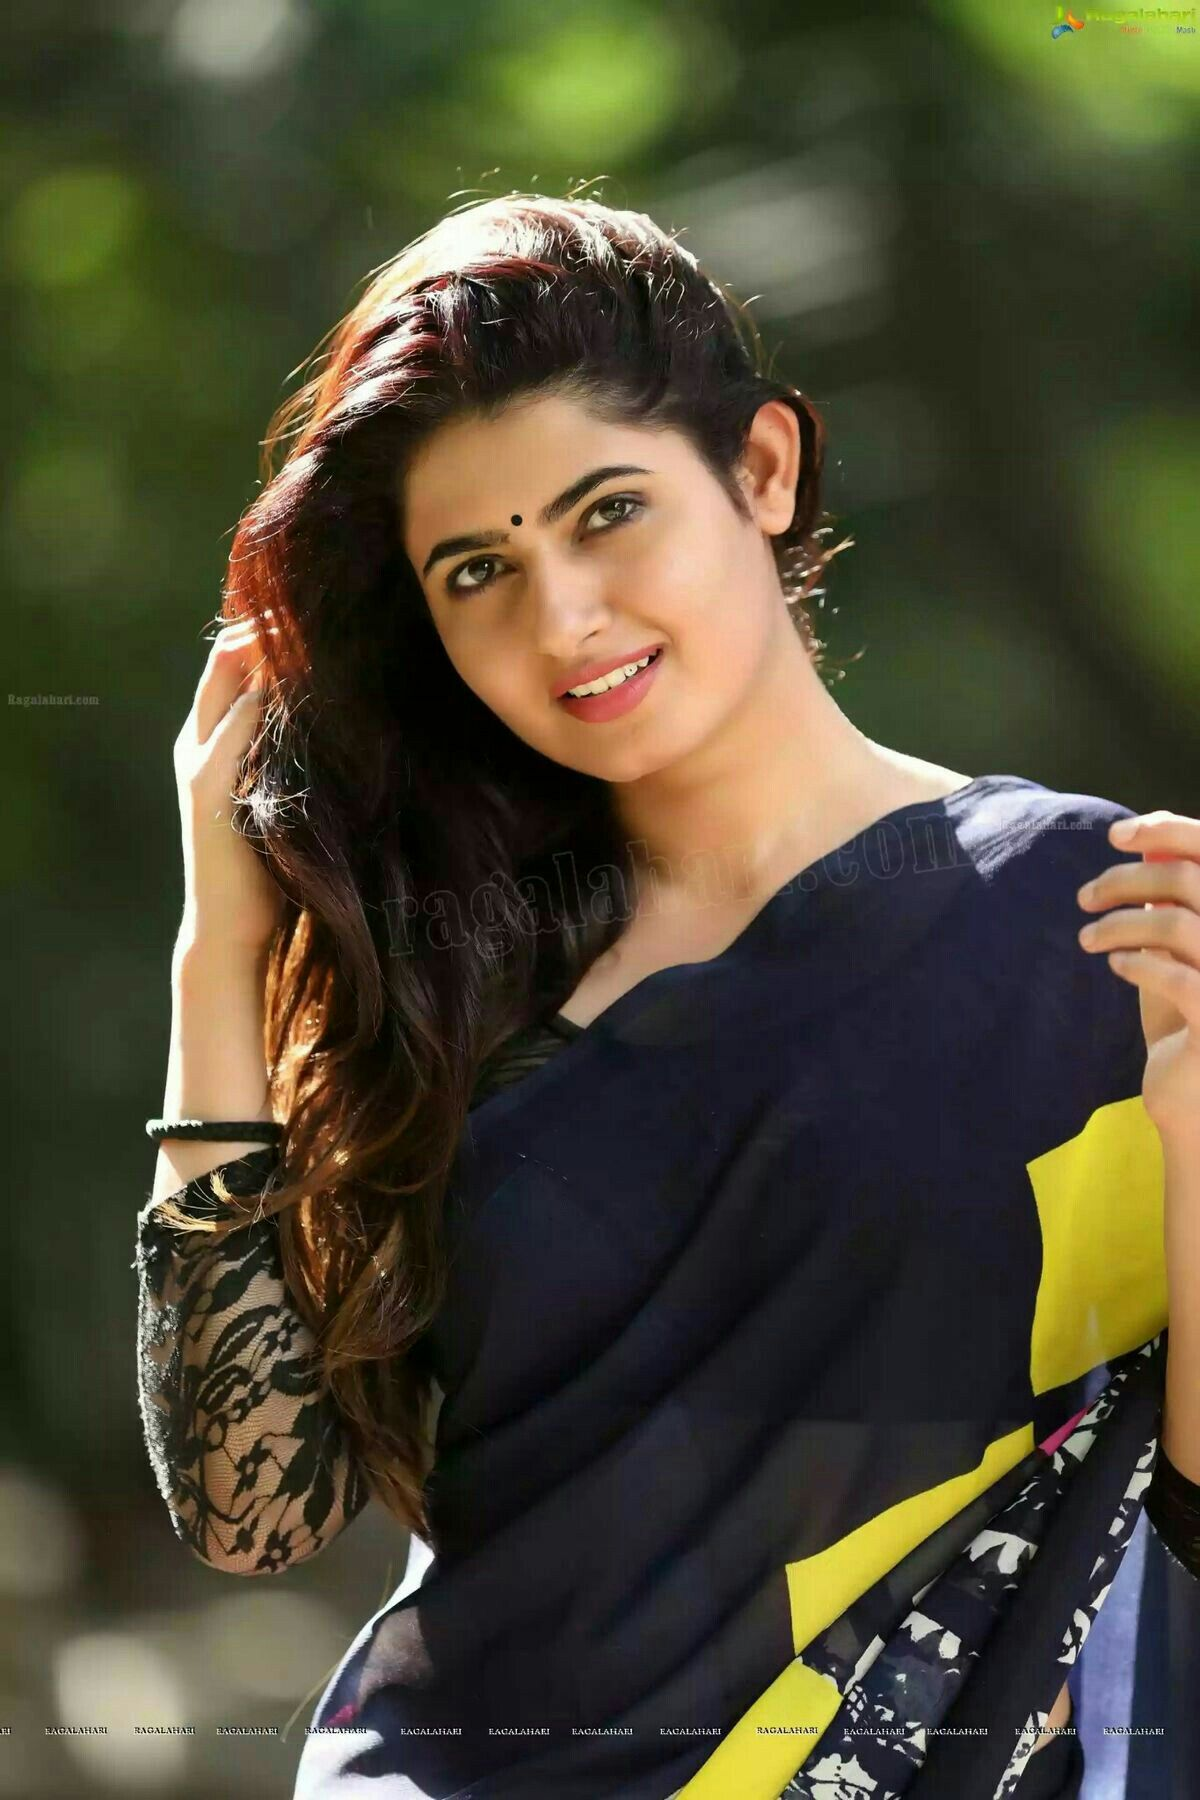 Photos of beautiful indian ladies